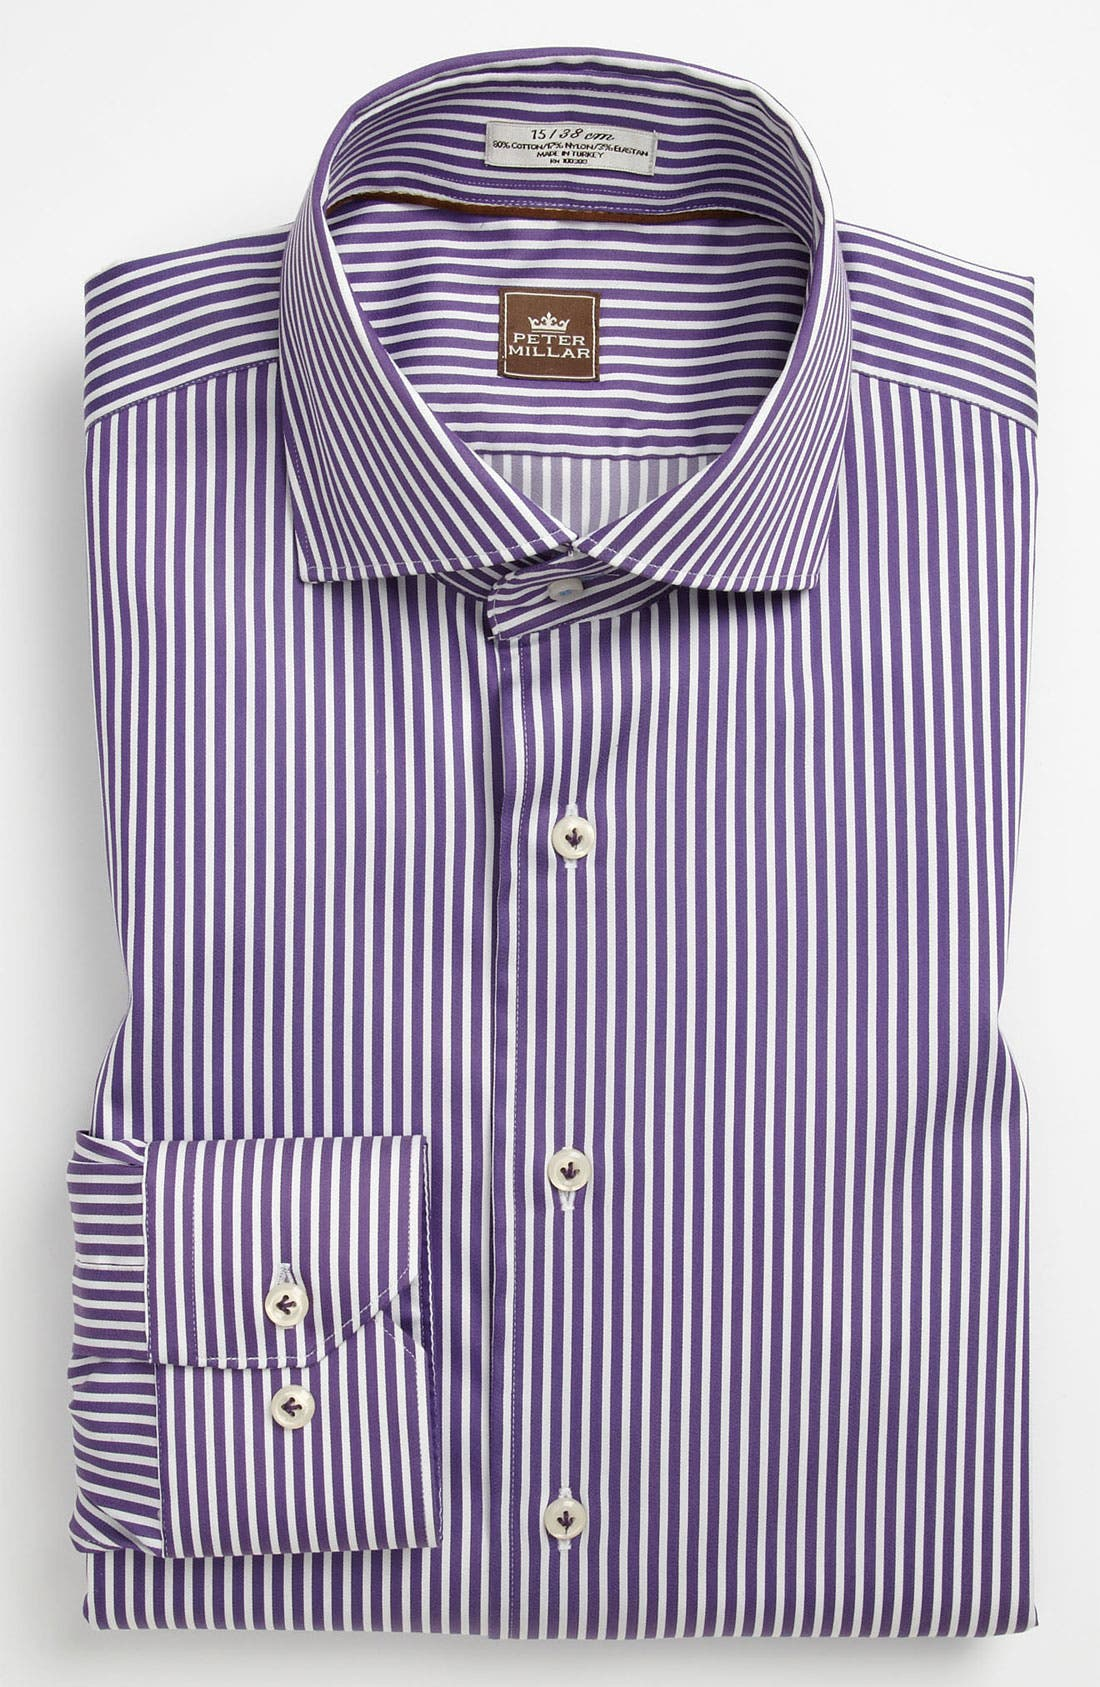 Alternate Image 1 Selected - Peter Millar Regular Fit Dress Shirt